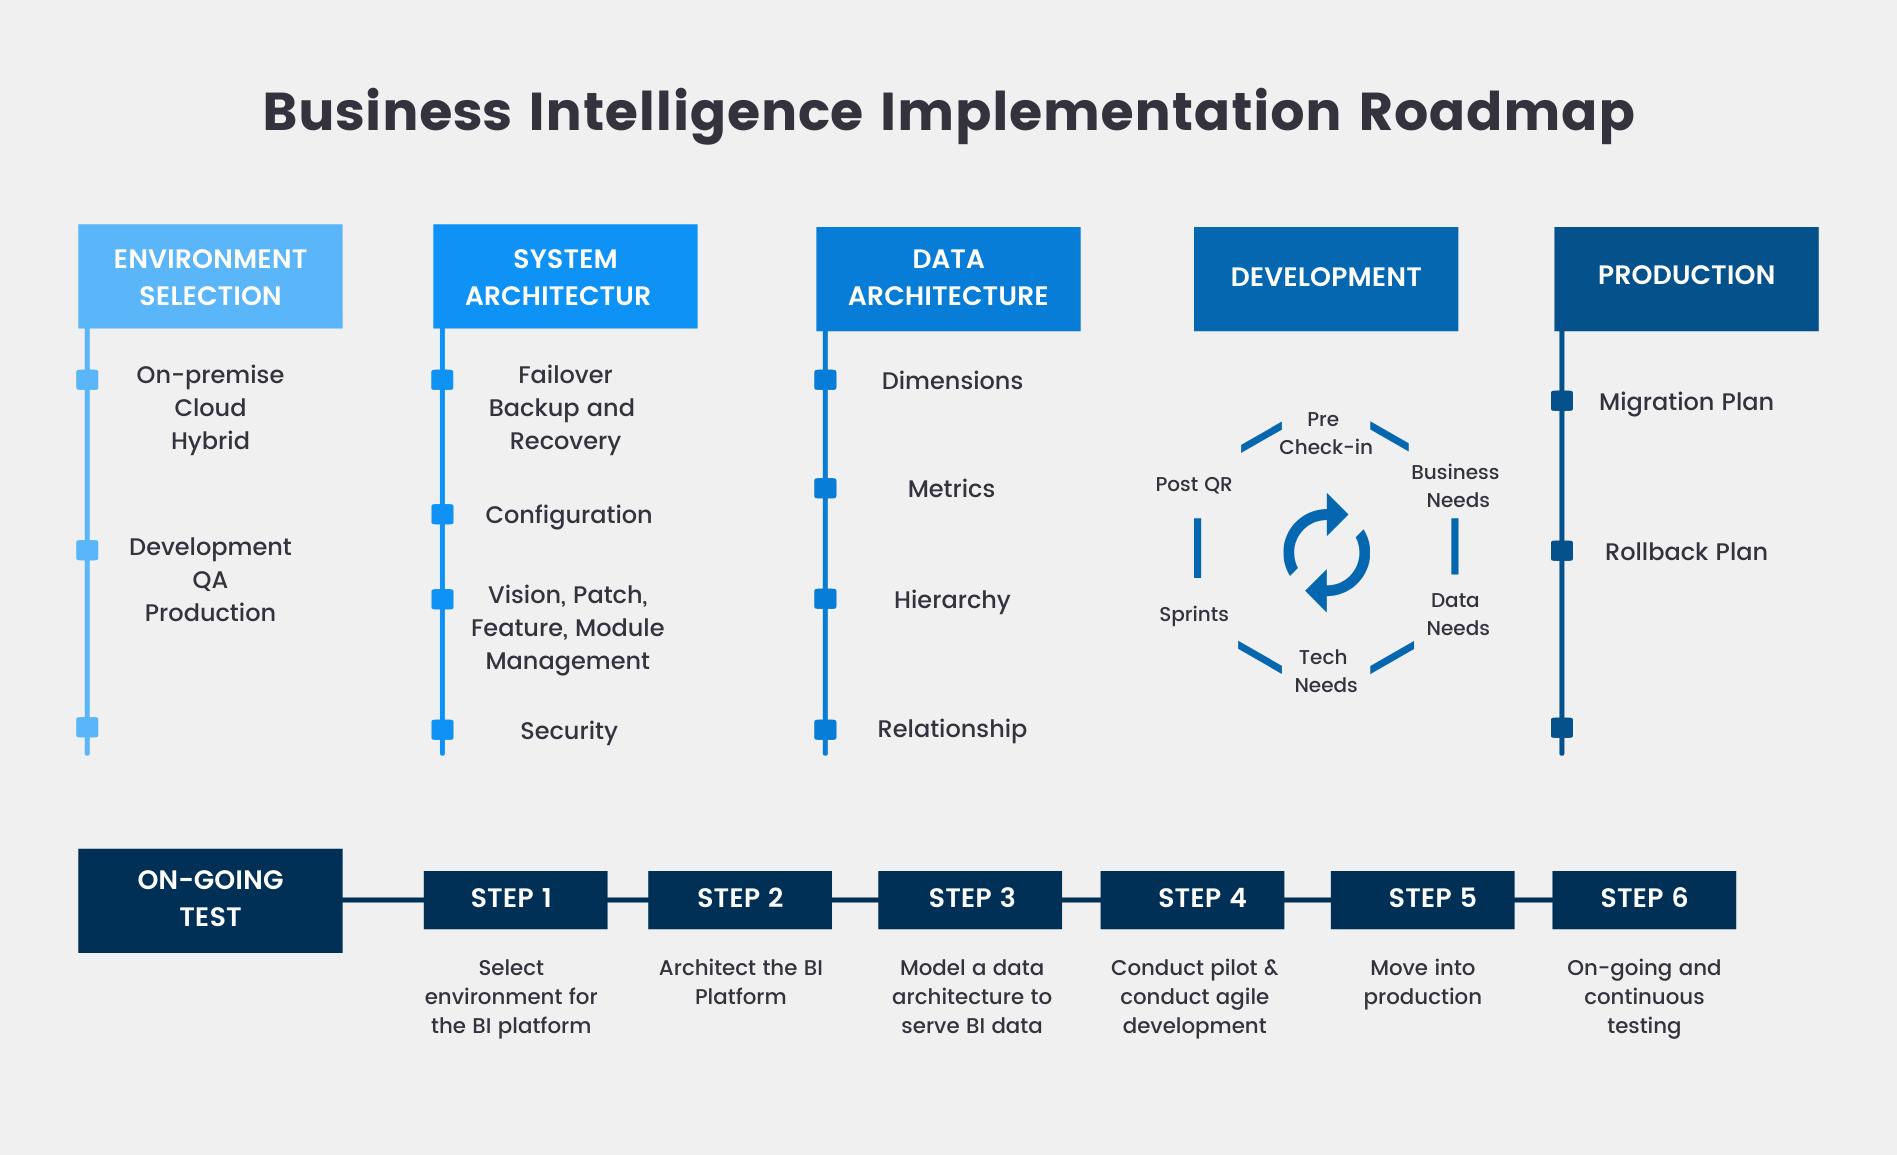 Business Intelligence Implementation Roadmap